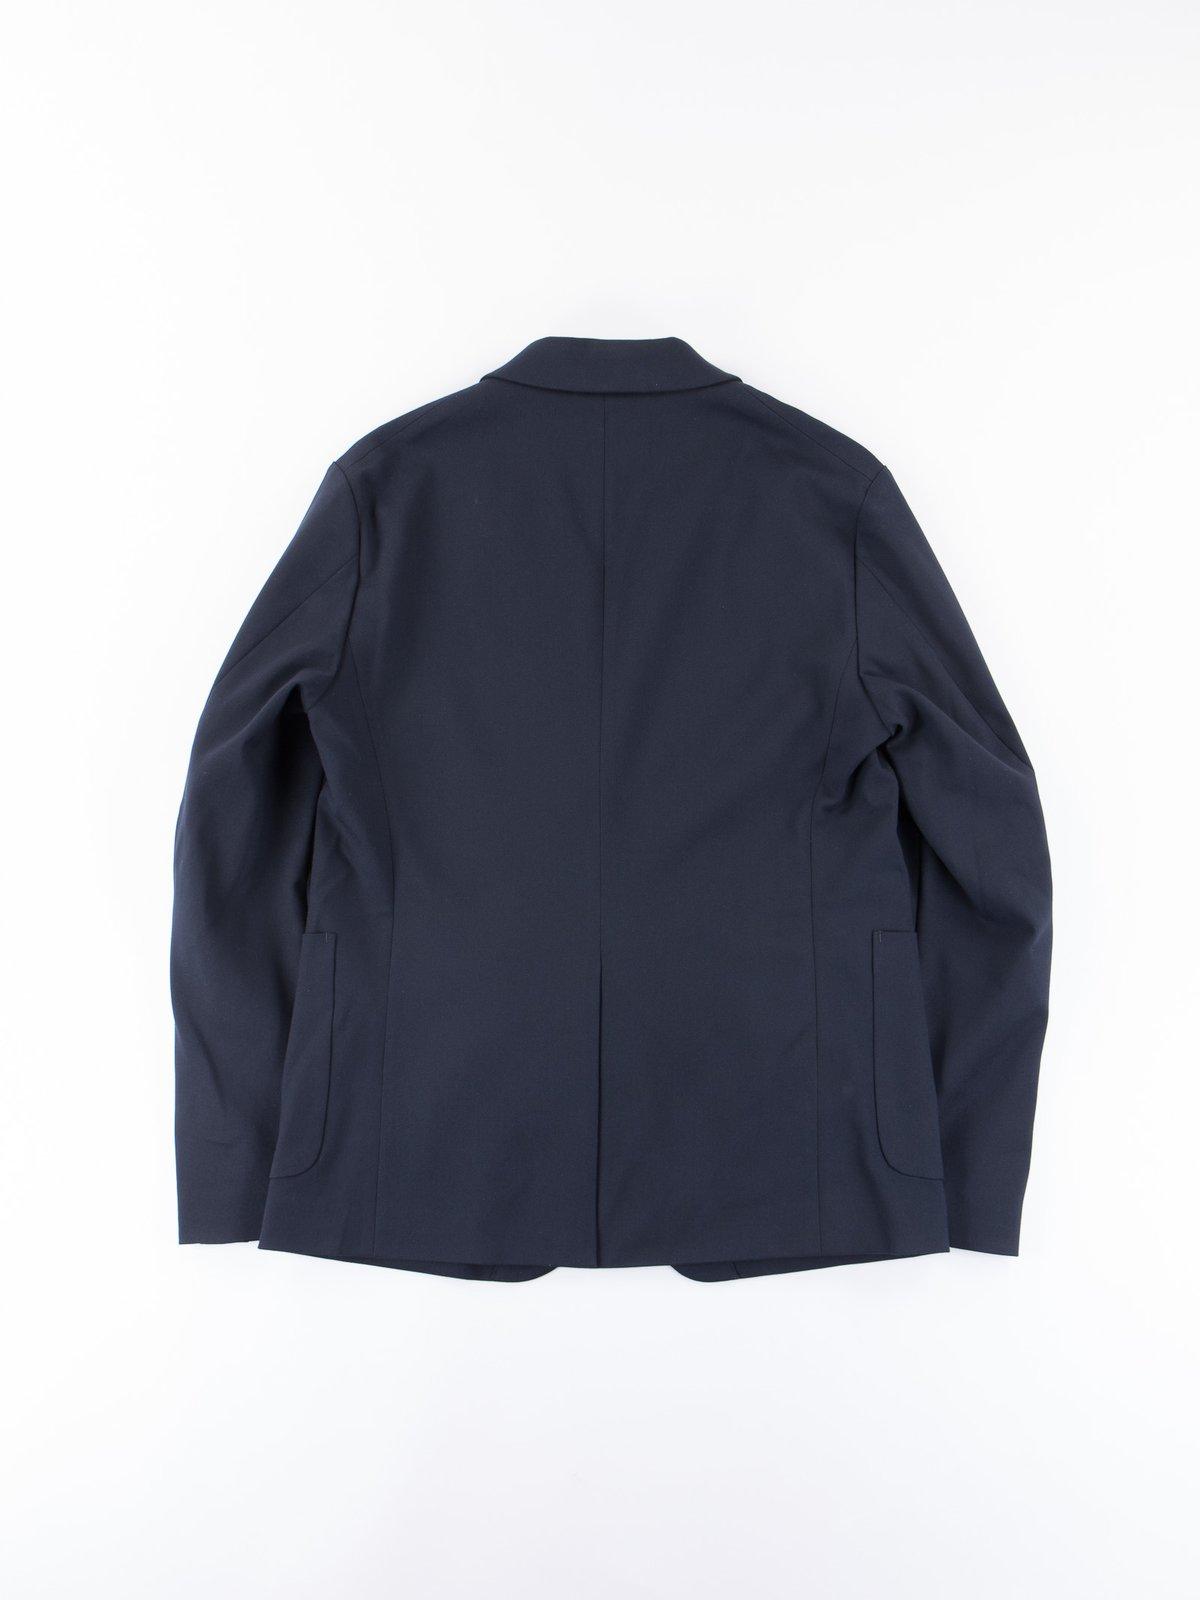 Dark Navy Lounge Jacket - Image 6